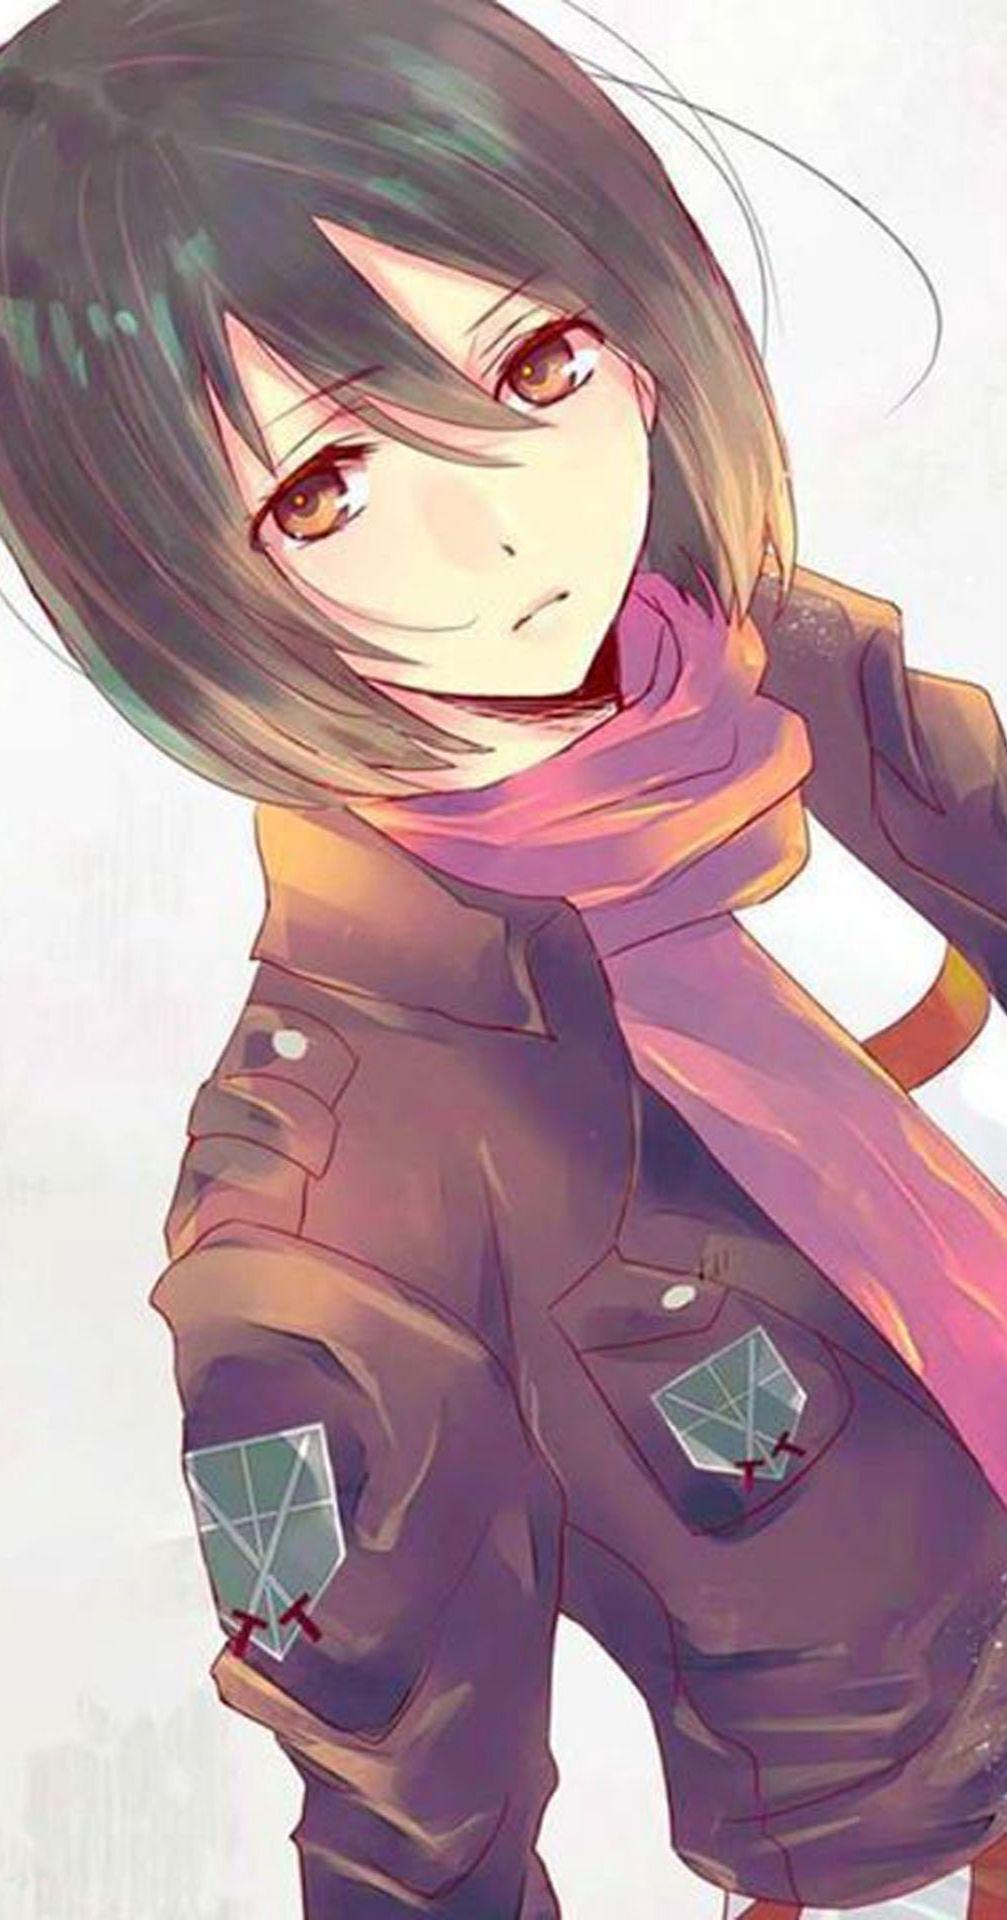 Fondos De Pantalla chingones de Anime